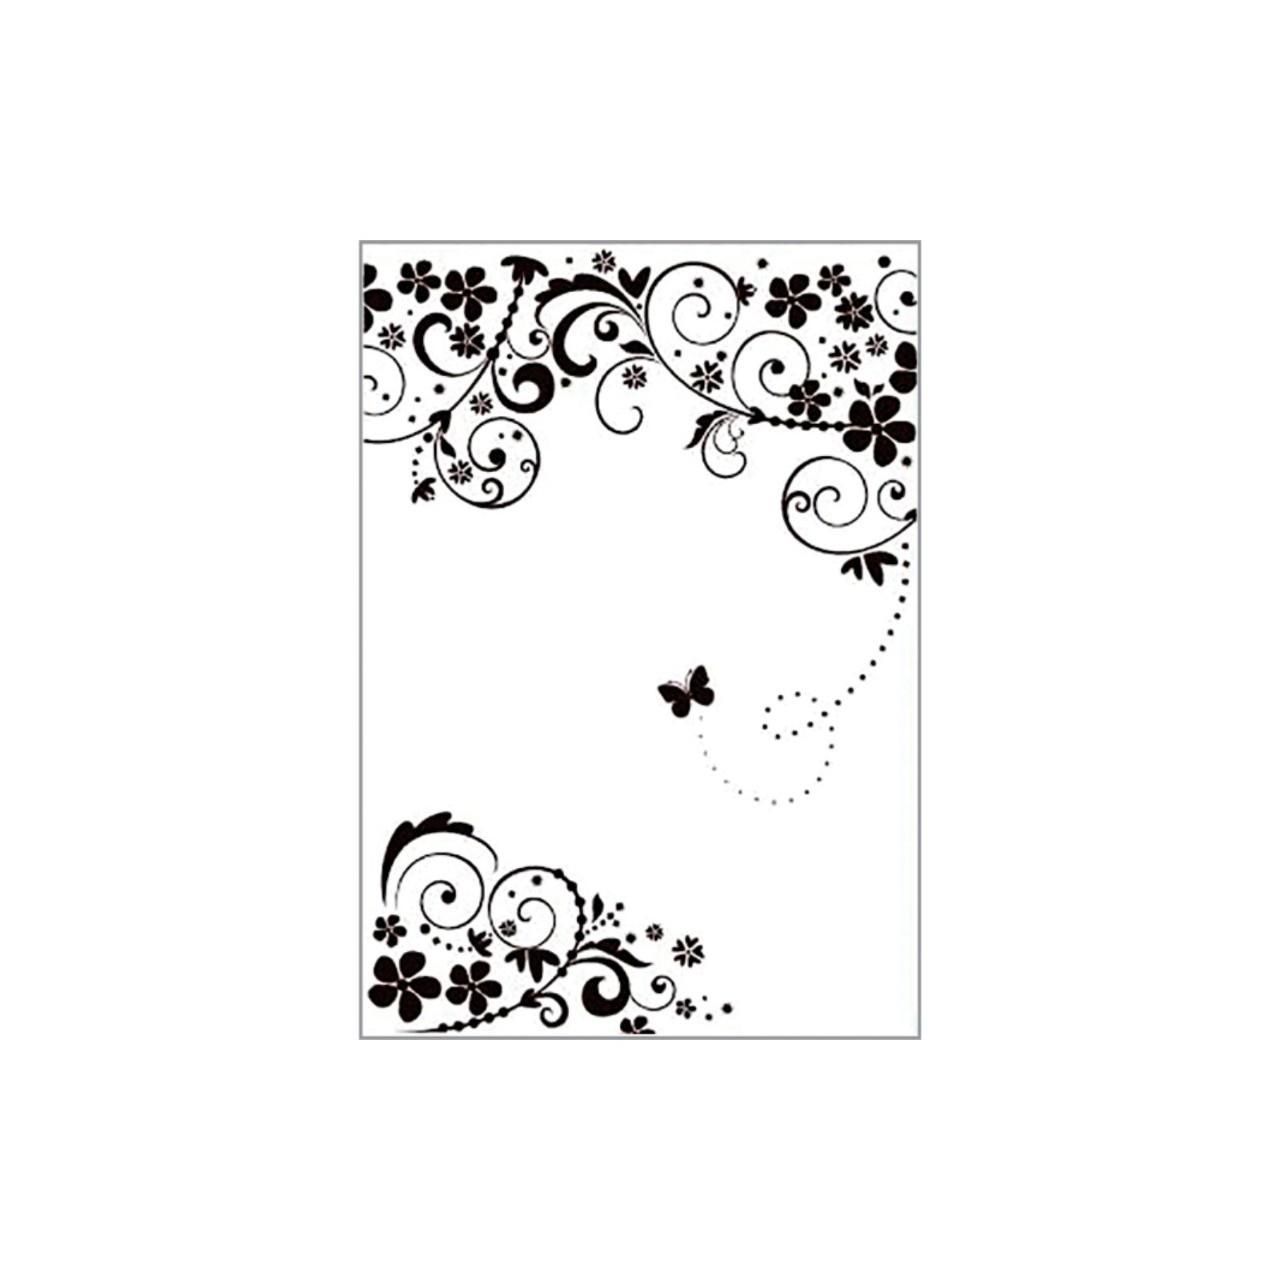 Placa para Relevo 21x29,7 cm - Arabesco Borboleta / Sunlit  - JuJu Scrapbook